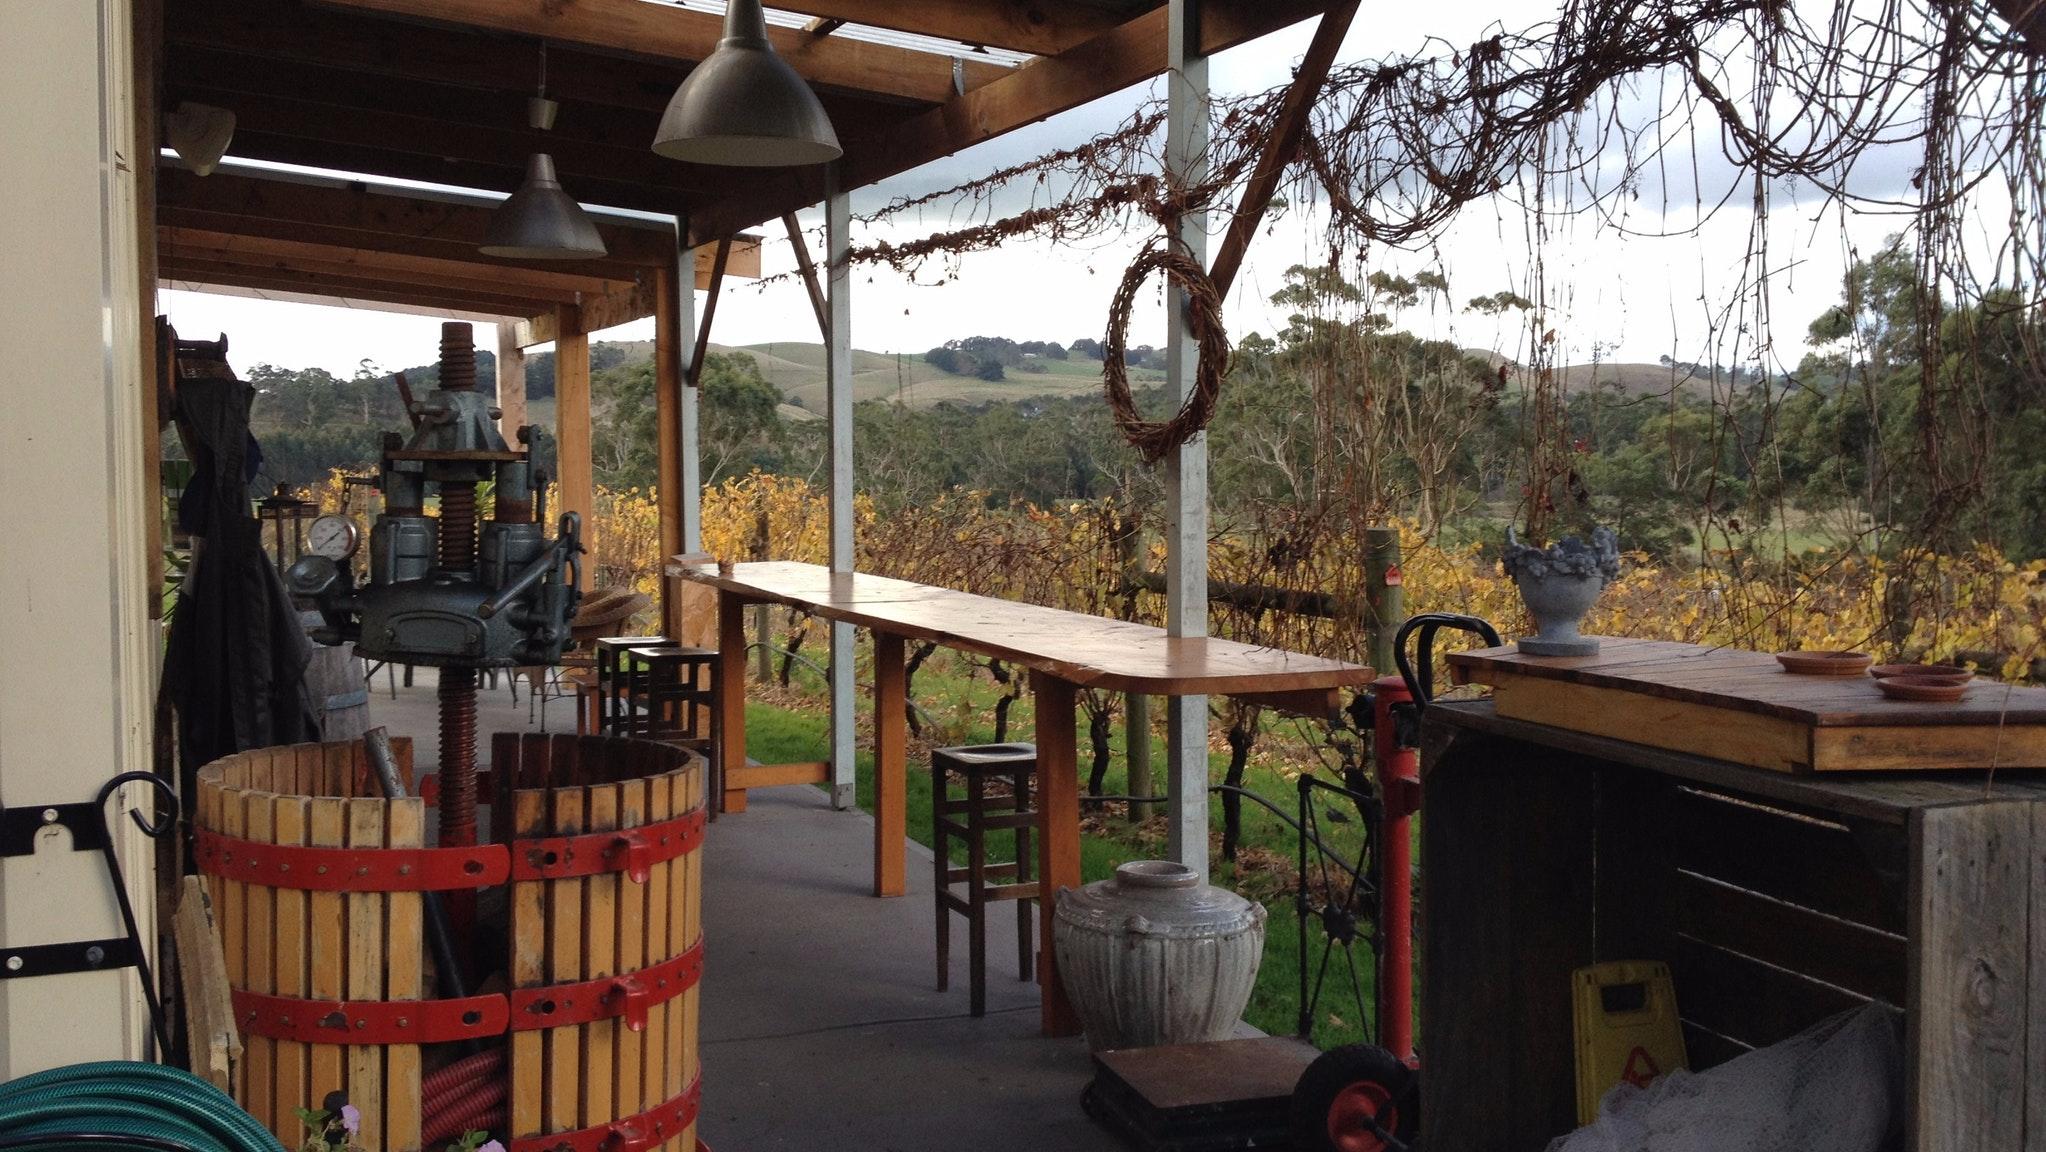 Patio overlooking vineyard at Gippsland Wine Company